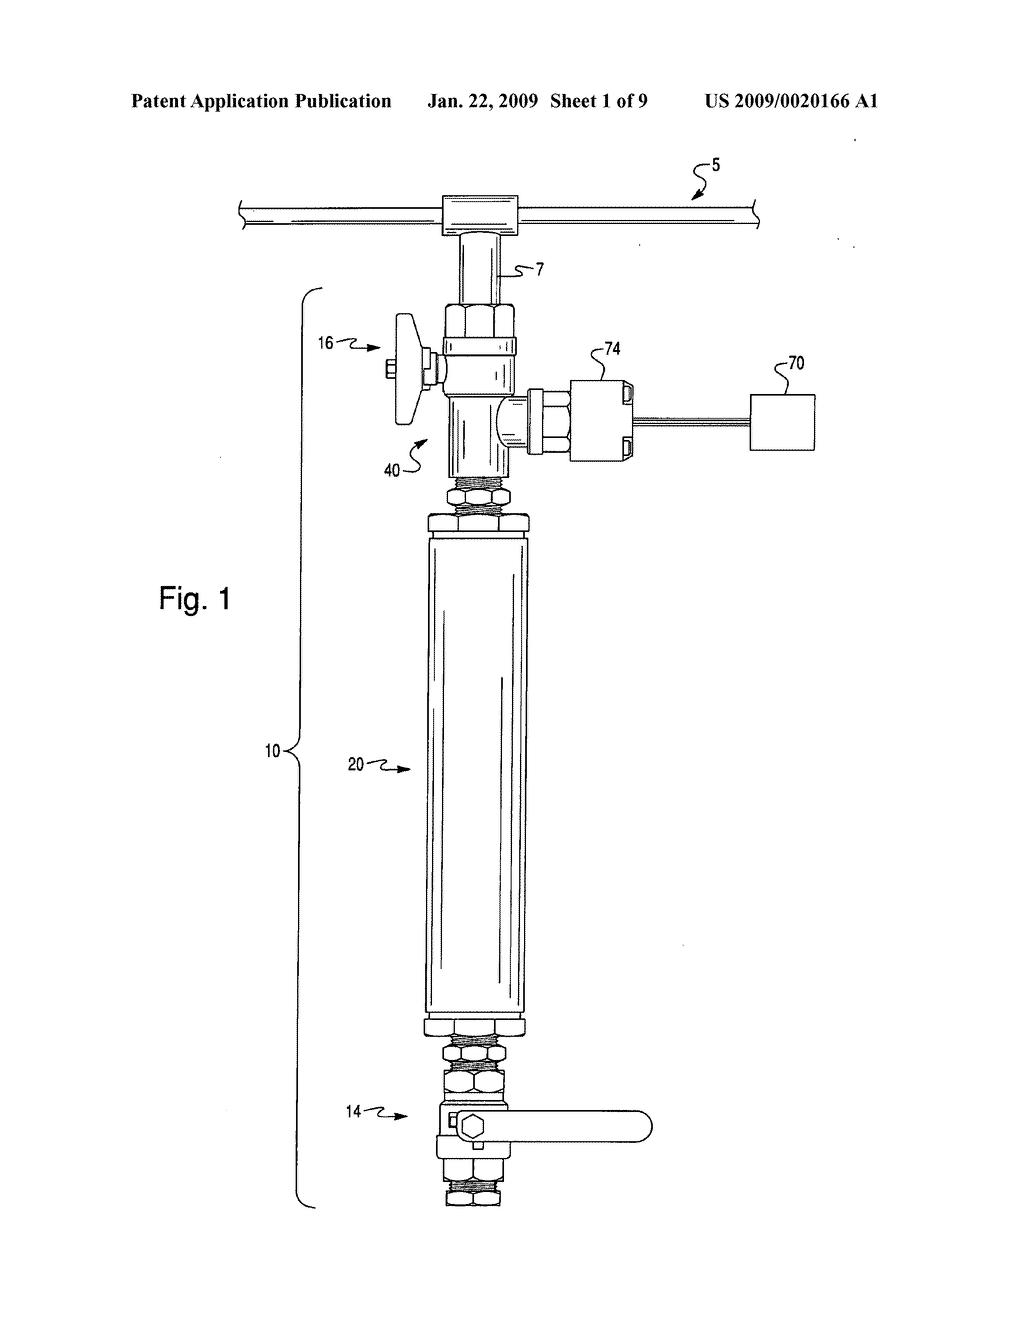 hight resolution of condensate collector arrangement for dry pipe sprinkler system 4 sprinkler riser diagram elbow piping sprinkler riser diagram